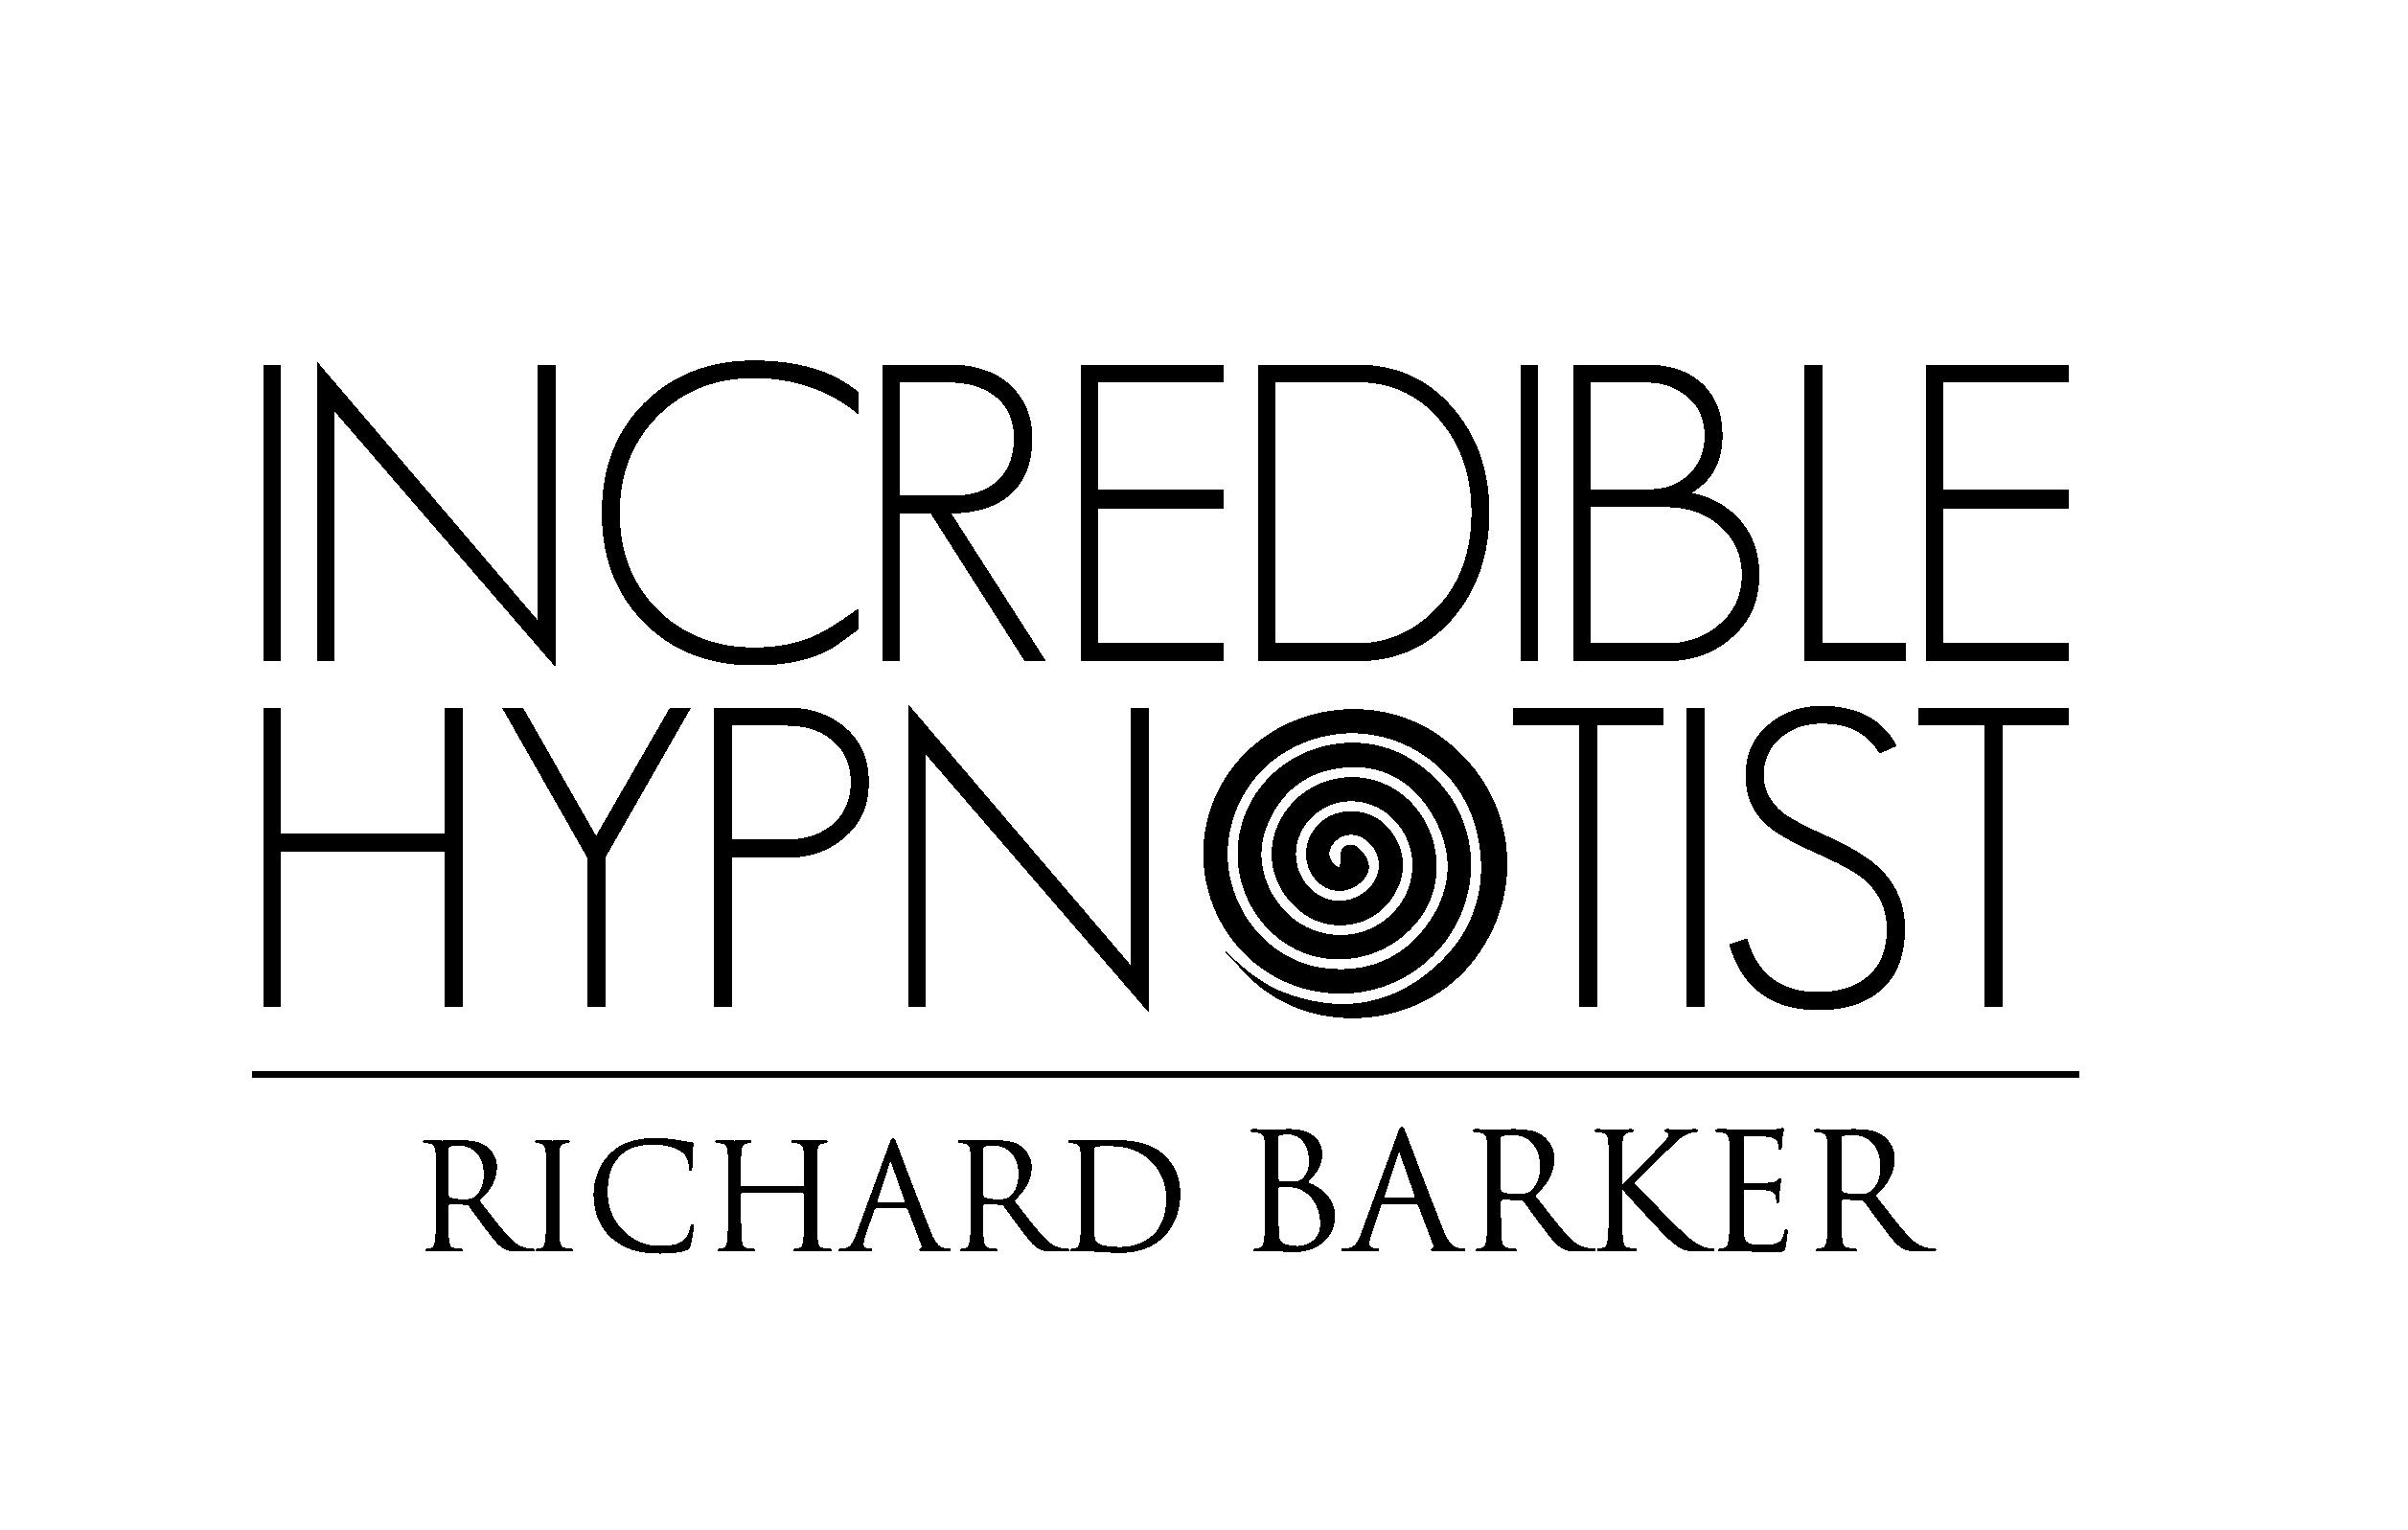 The Incredible Hypnotist Richard Barker